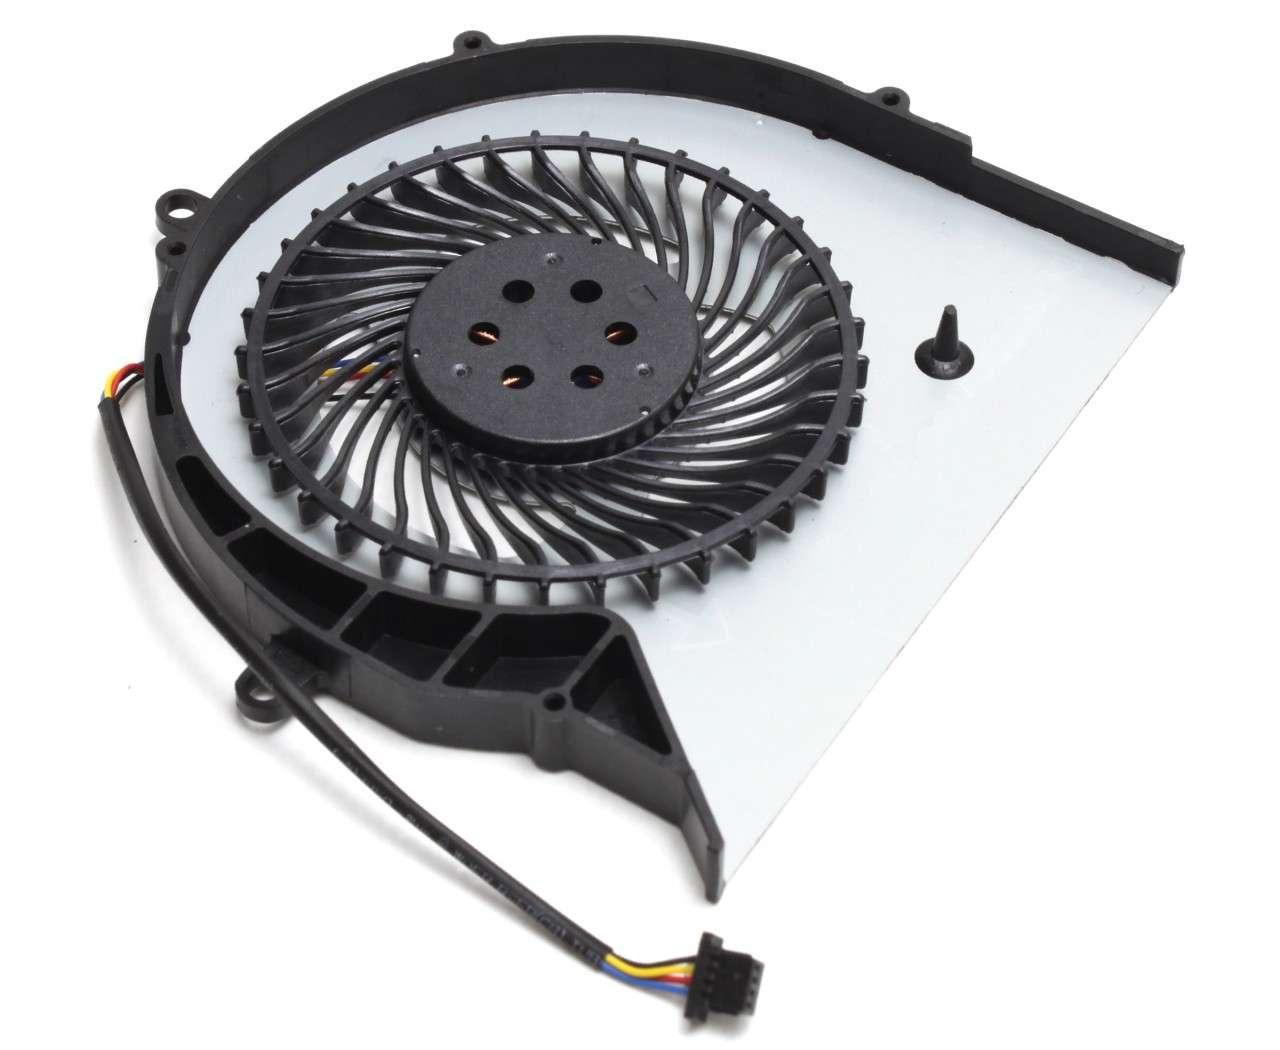 Cooler procesor CPU laptop Asus FZ63VM imagine powerlaptop.ro 2021